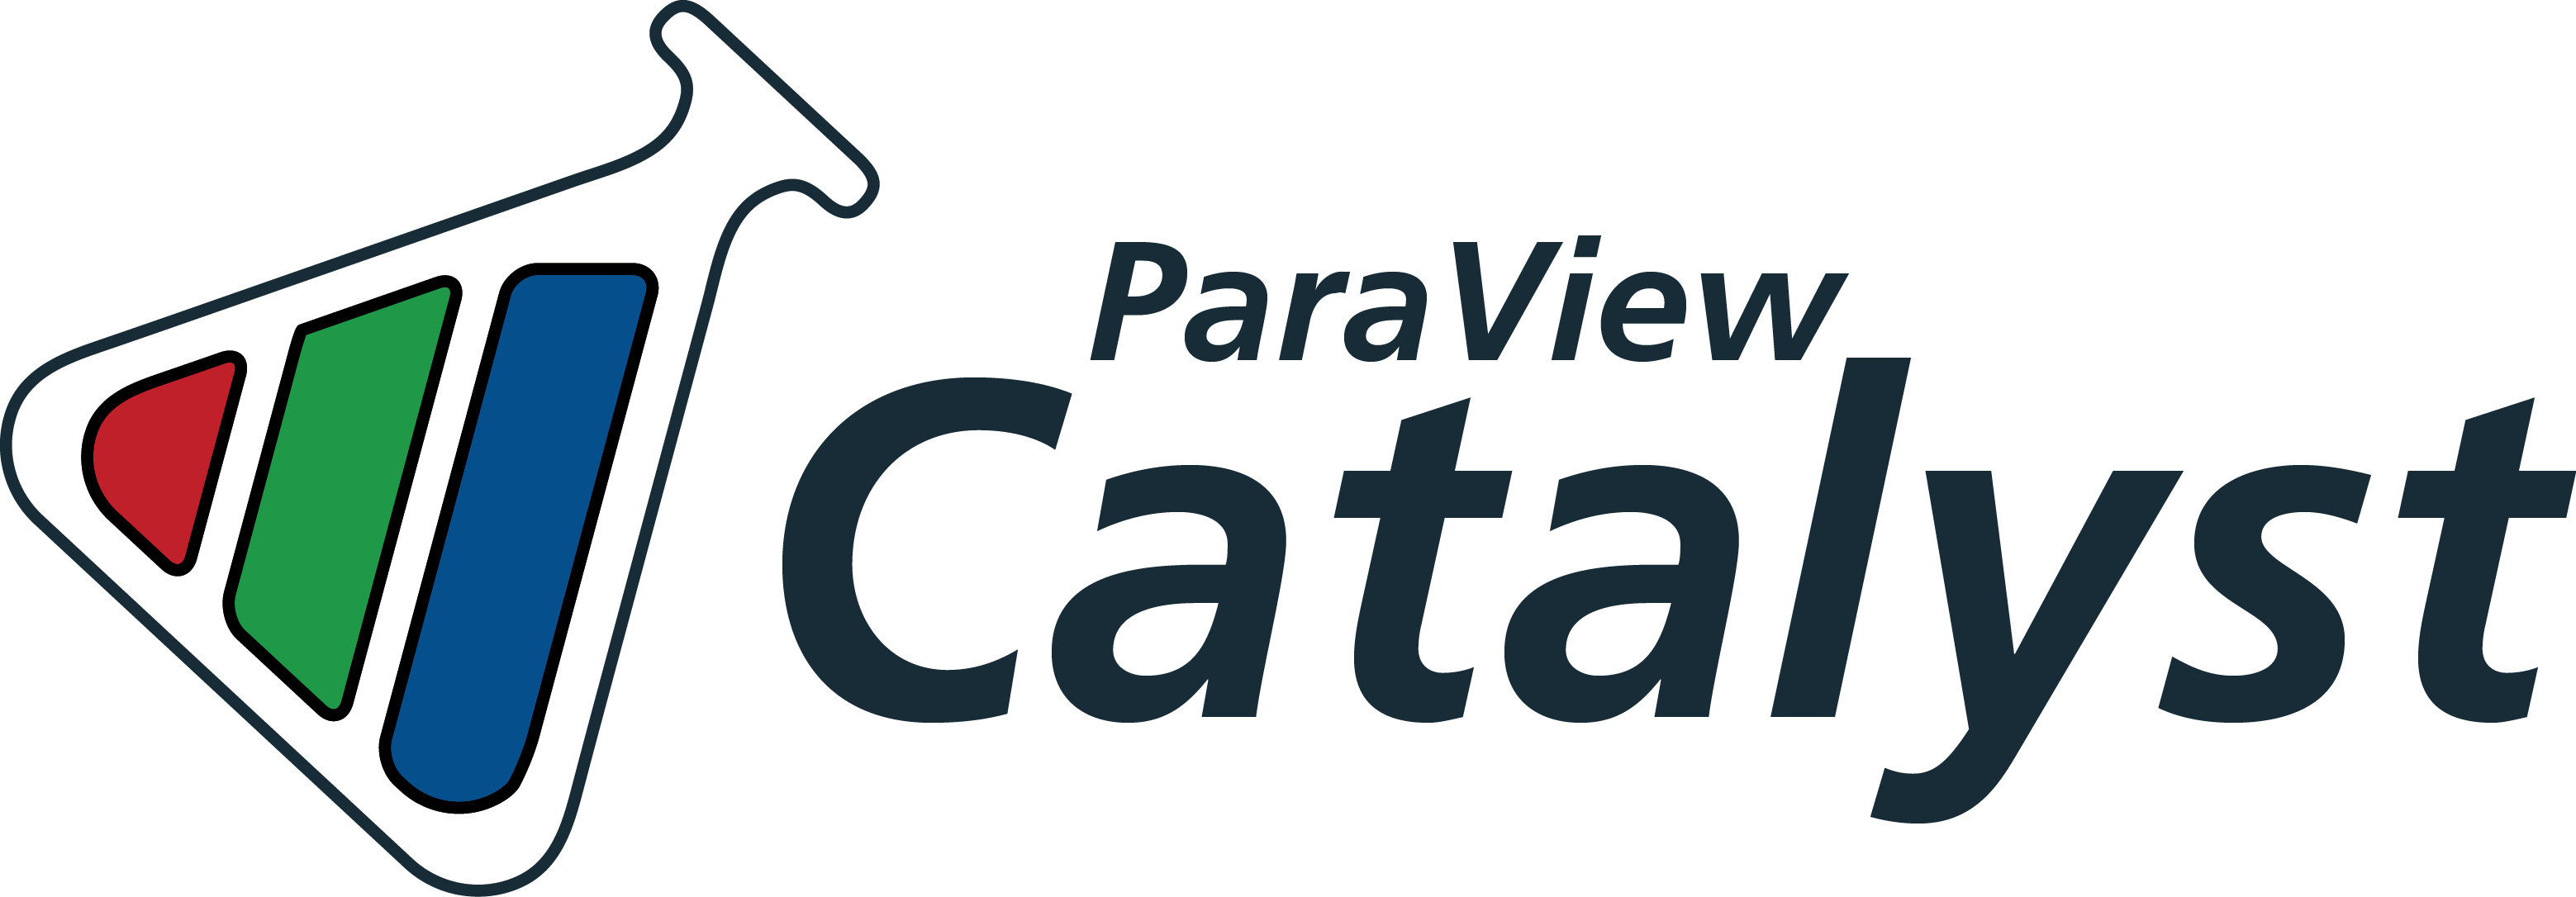 ParaViewCatalyst/Images/catalystlogo.png